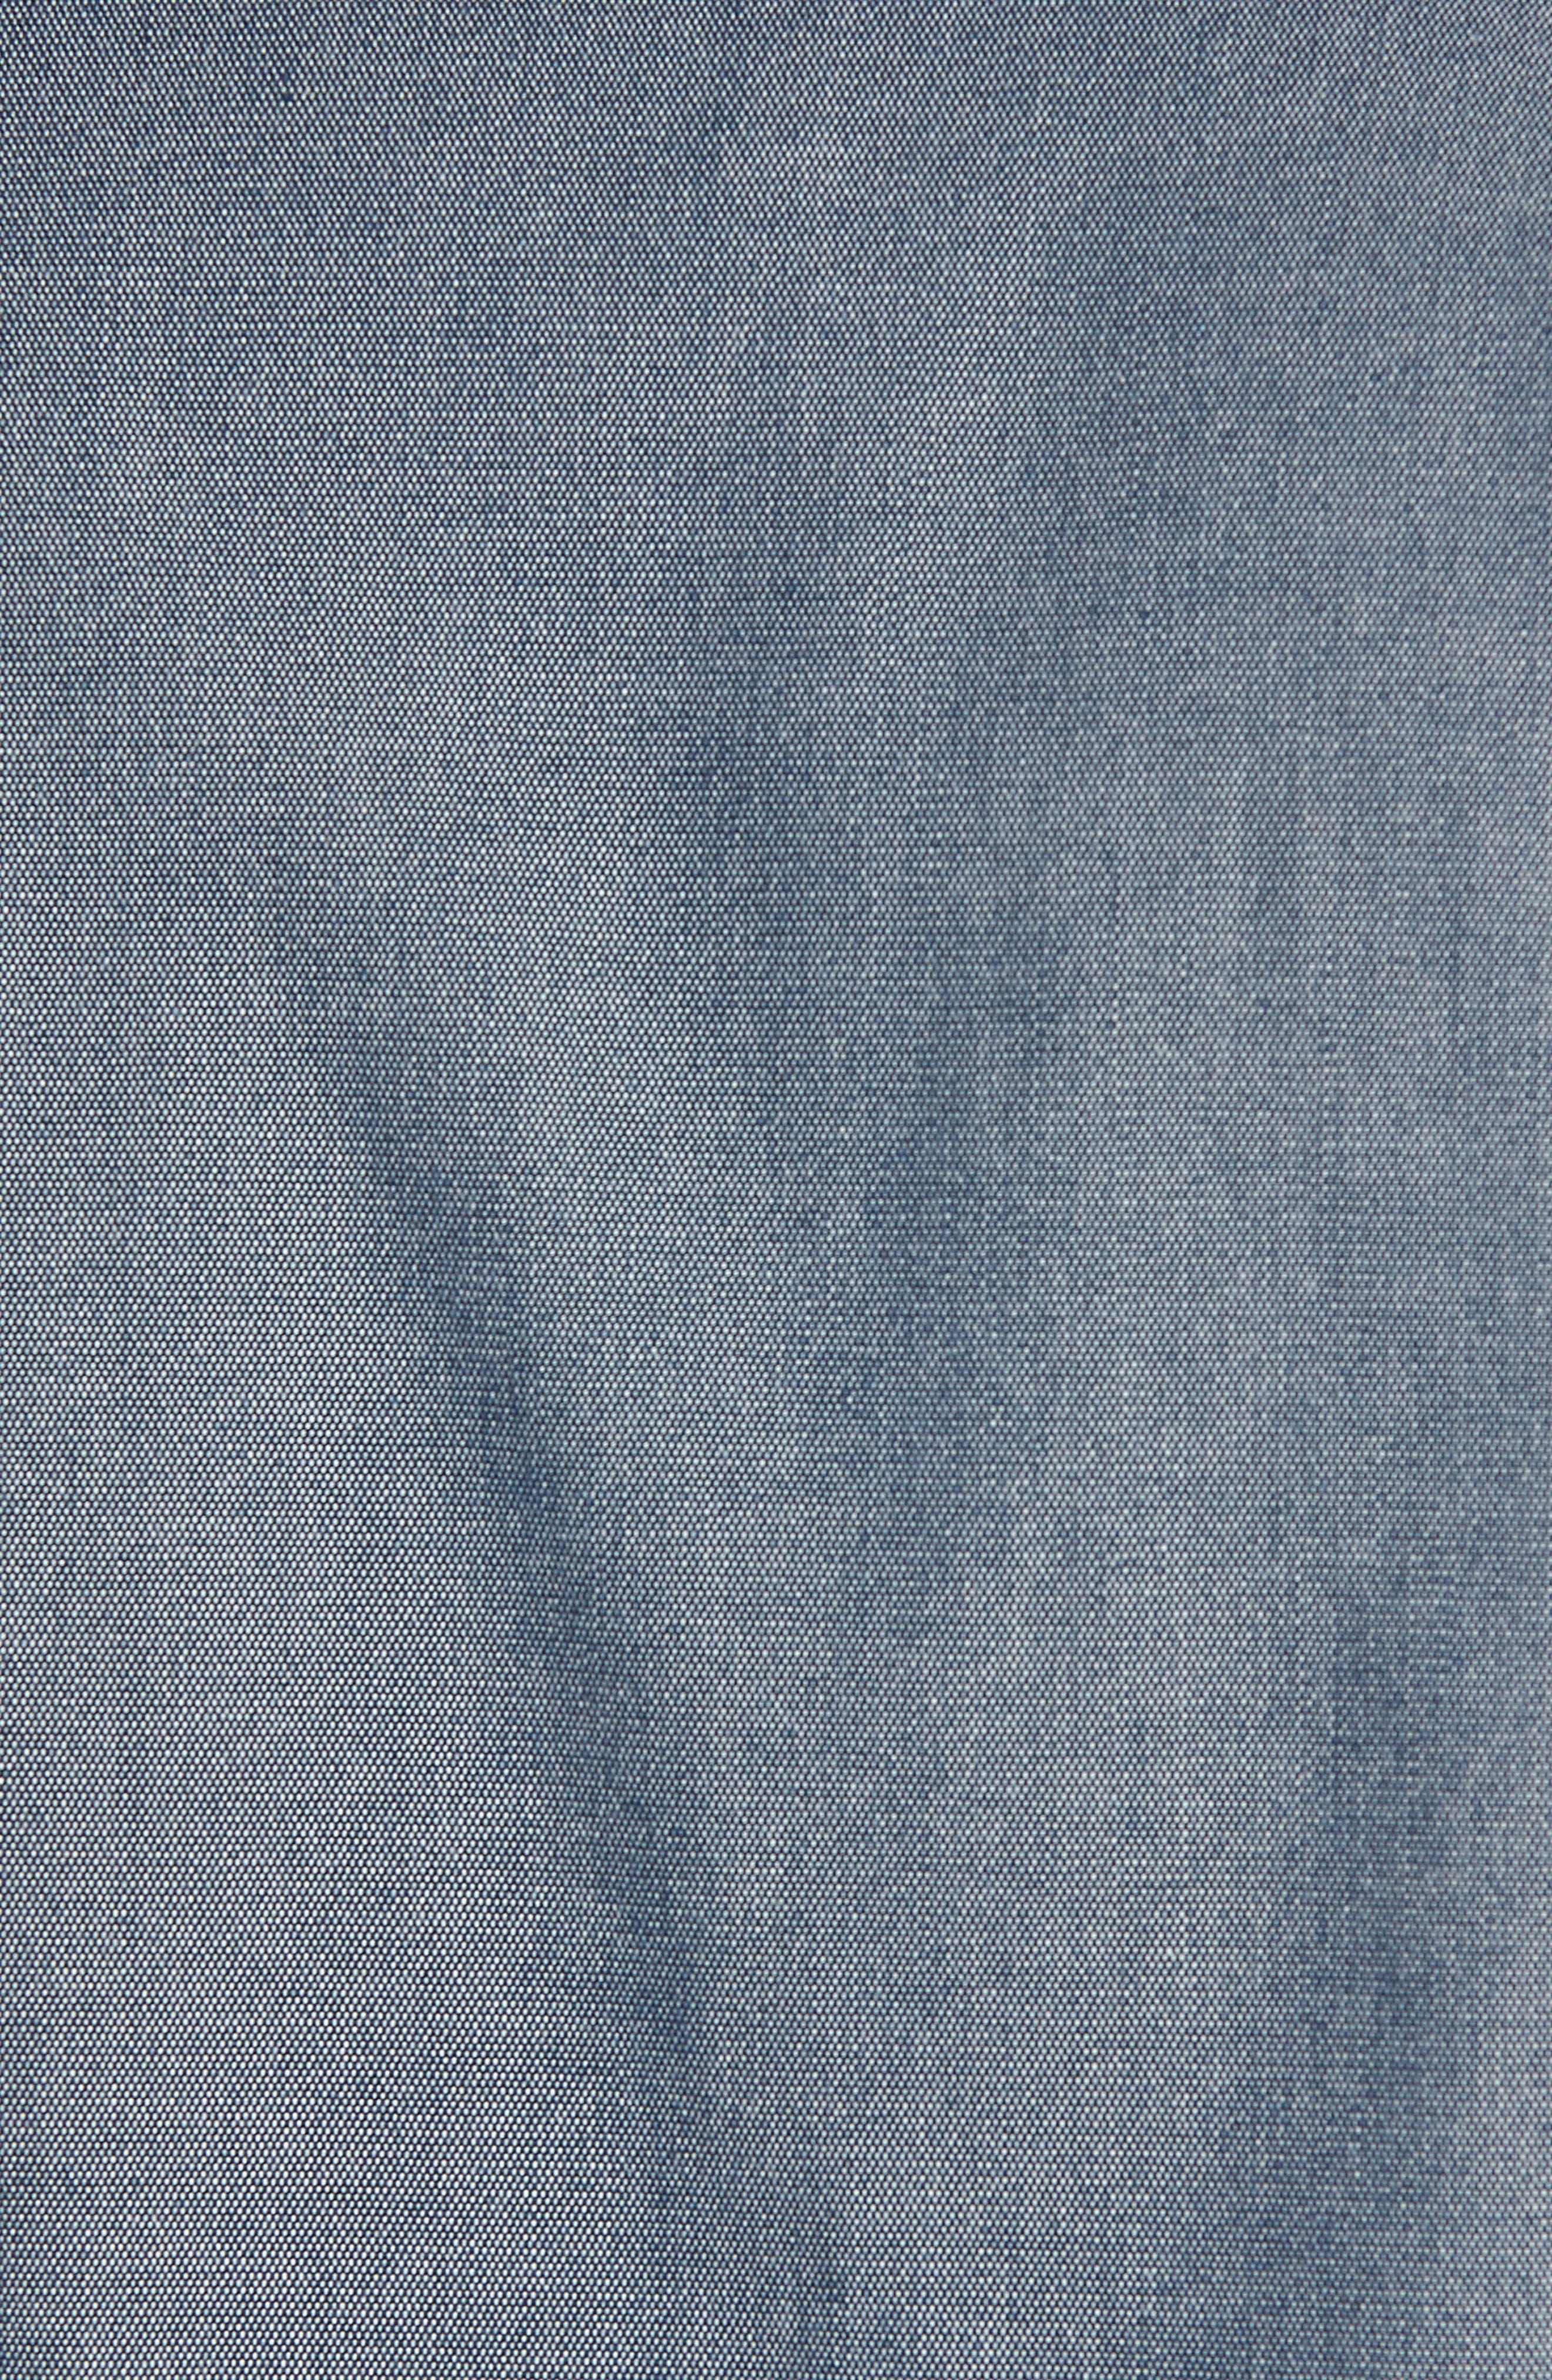 Harrington Jacket,                             Alternate thumbnail 6, color,                             420